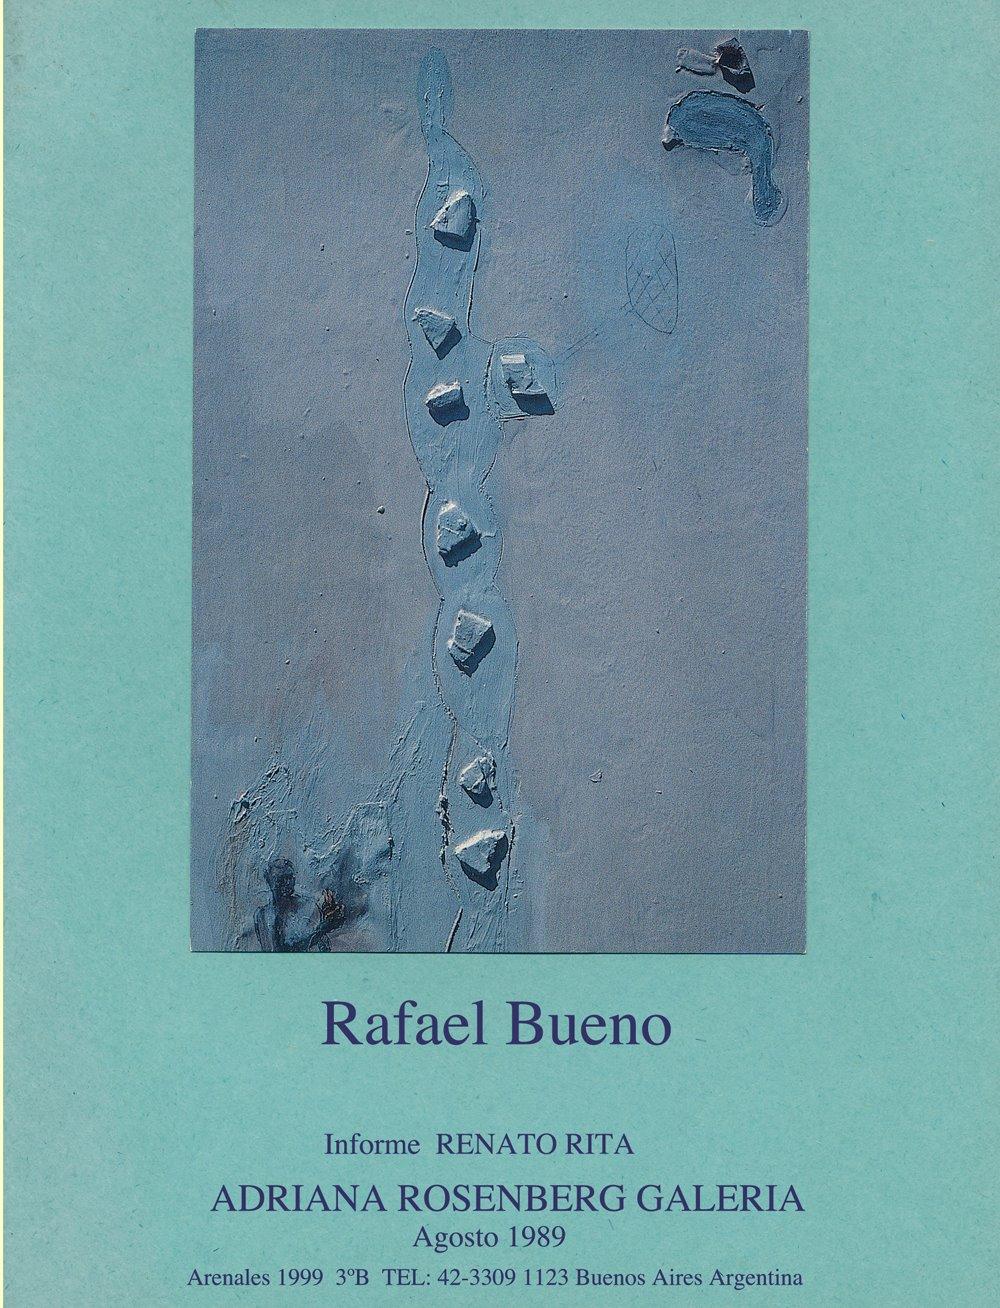 Informe Renato Rita: Rafael Bueno, Adriana Rosenberg Galeria, 1989